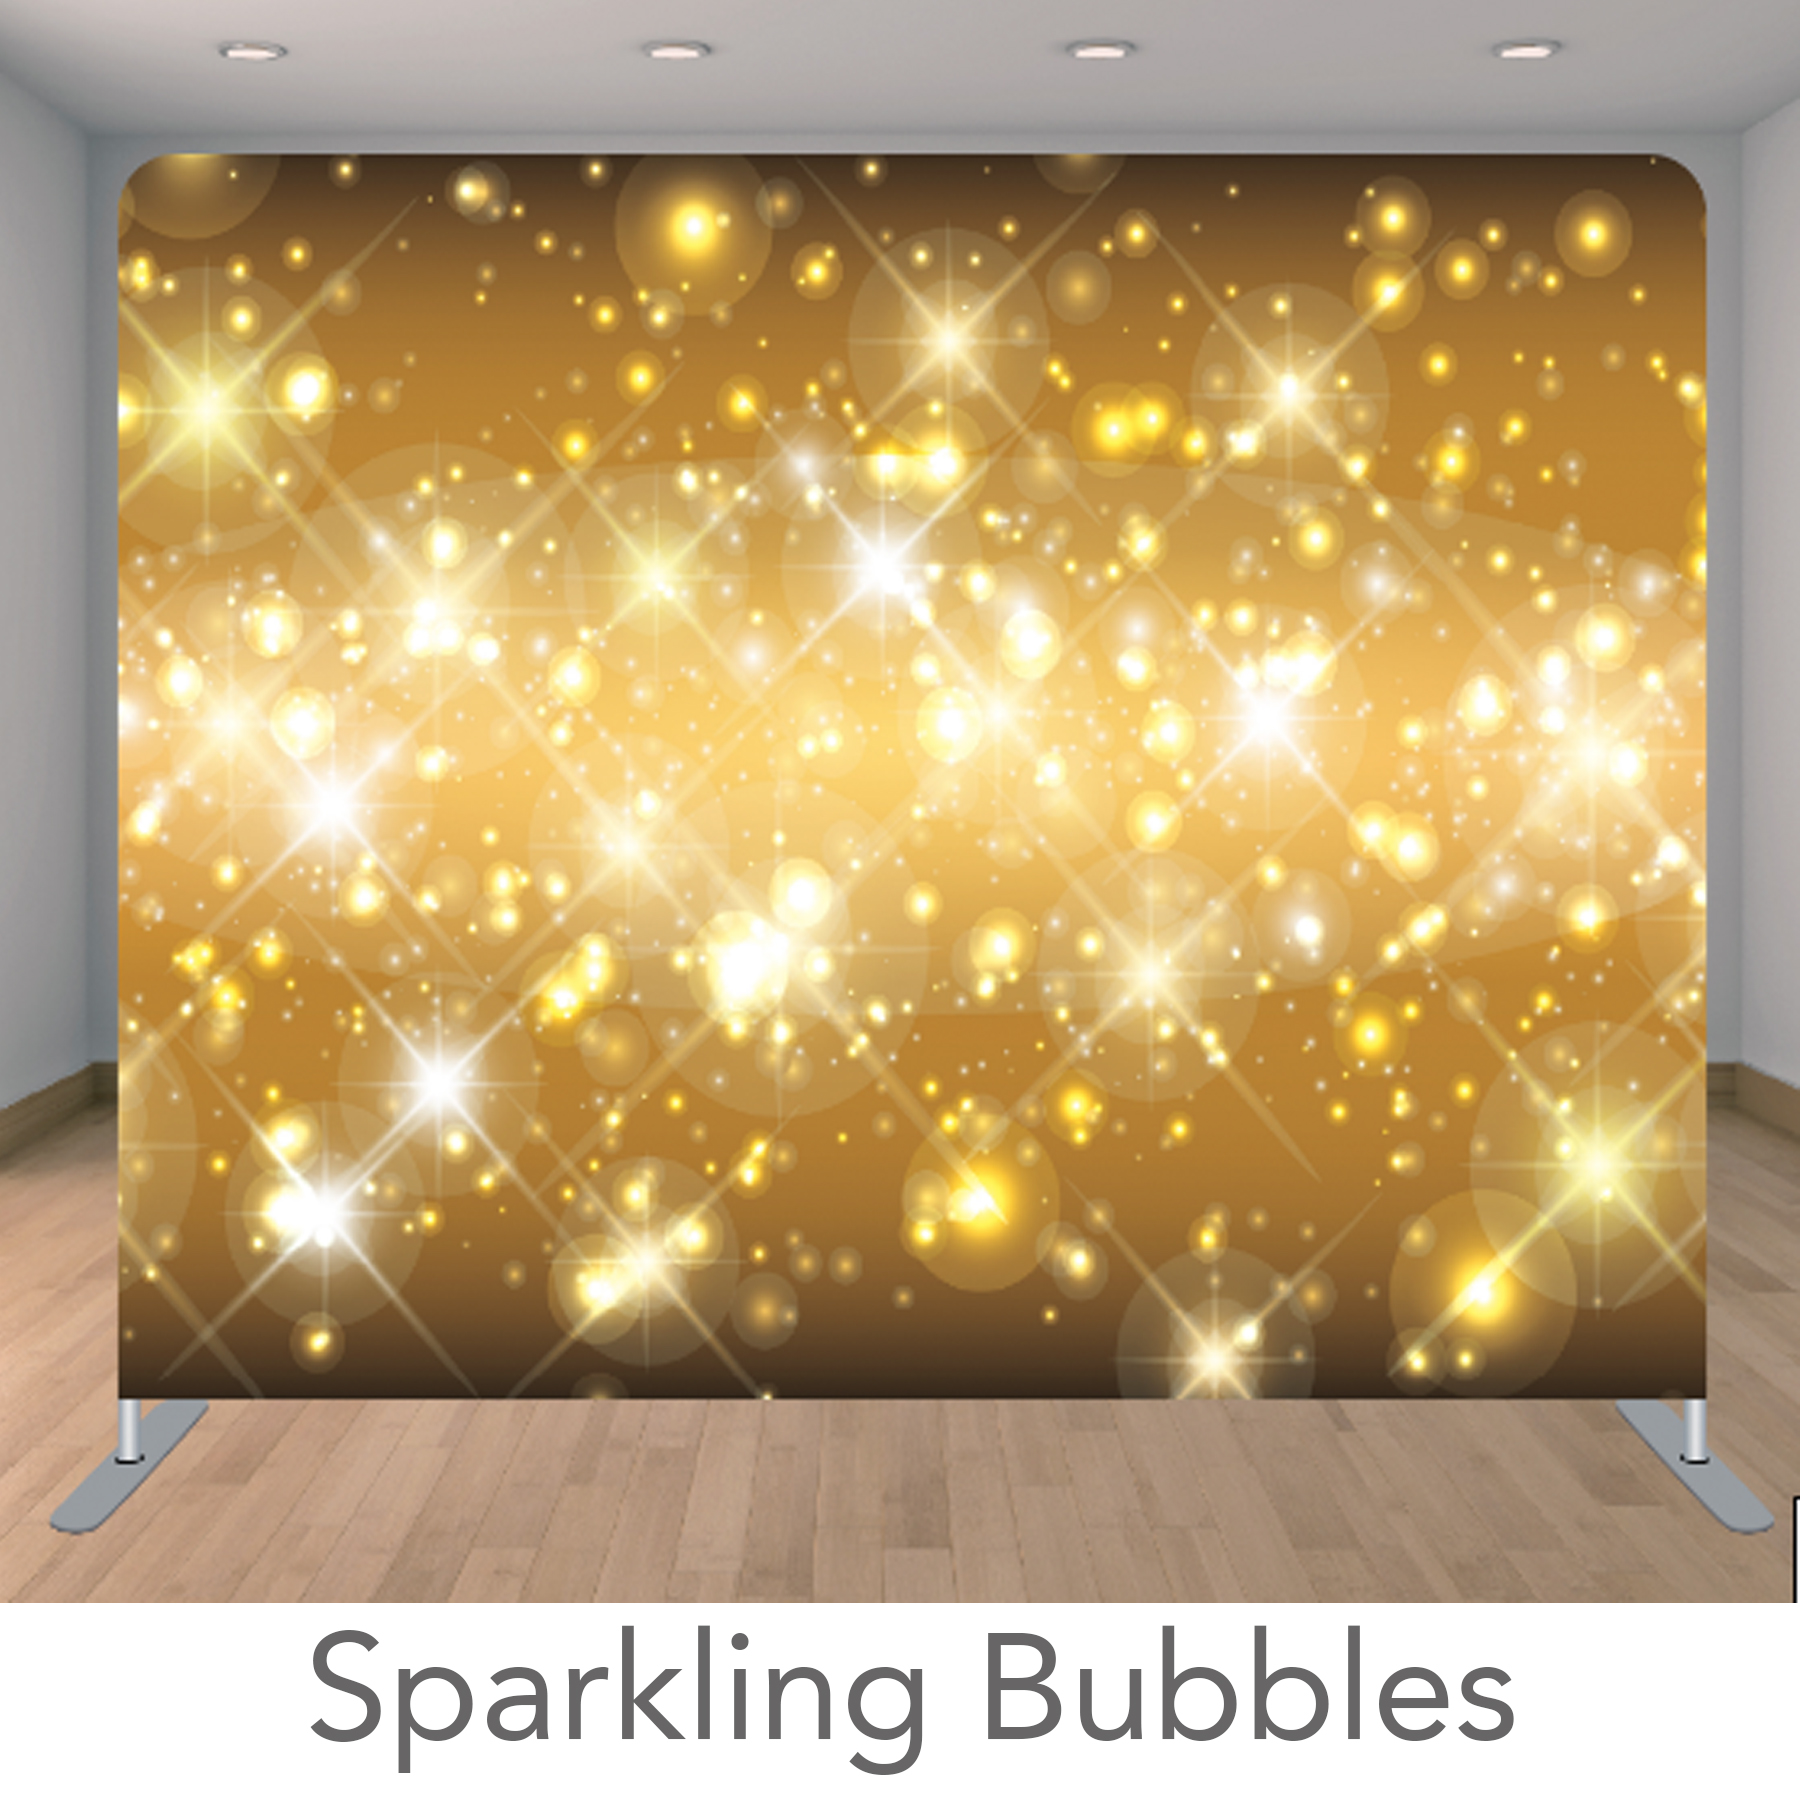 SparklingBubbles.jpg